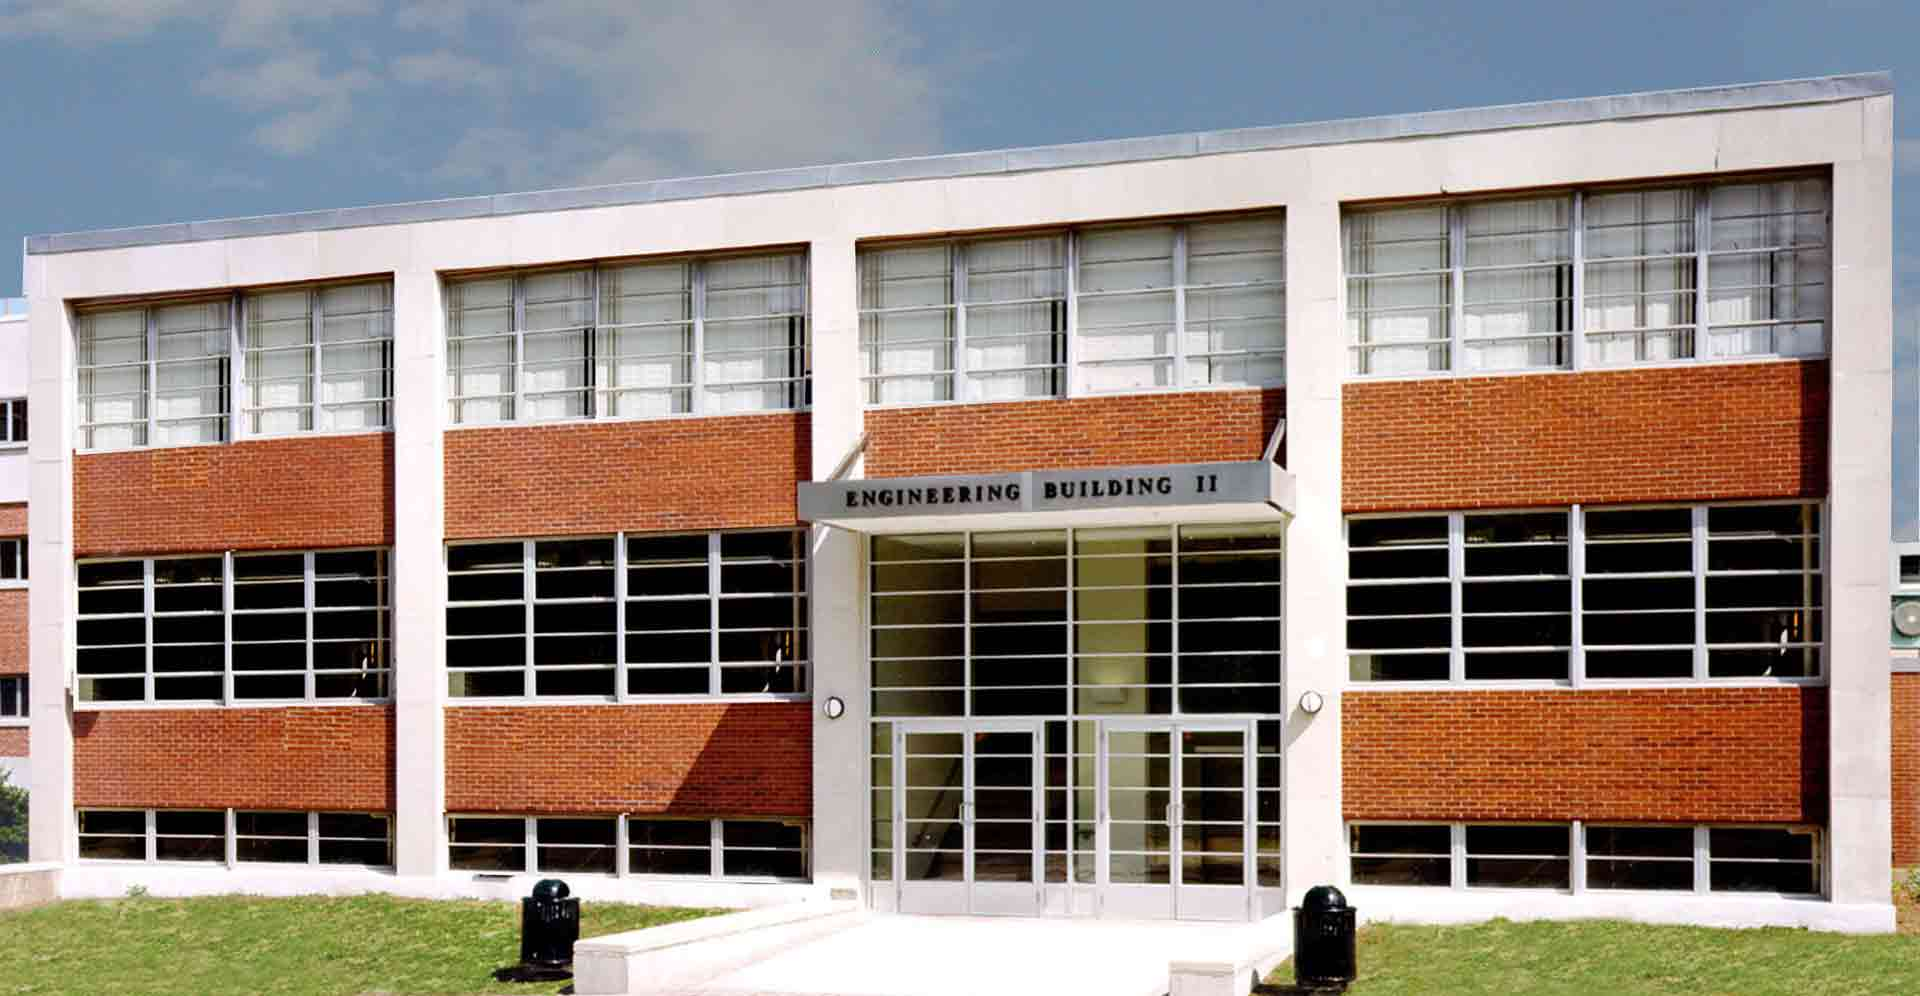 UConn Engineering Building II